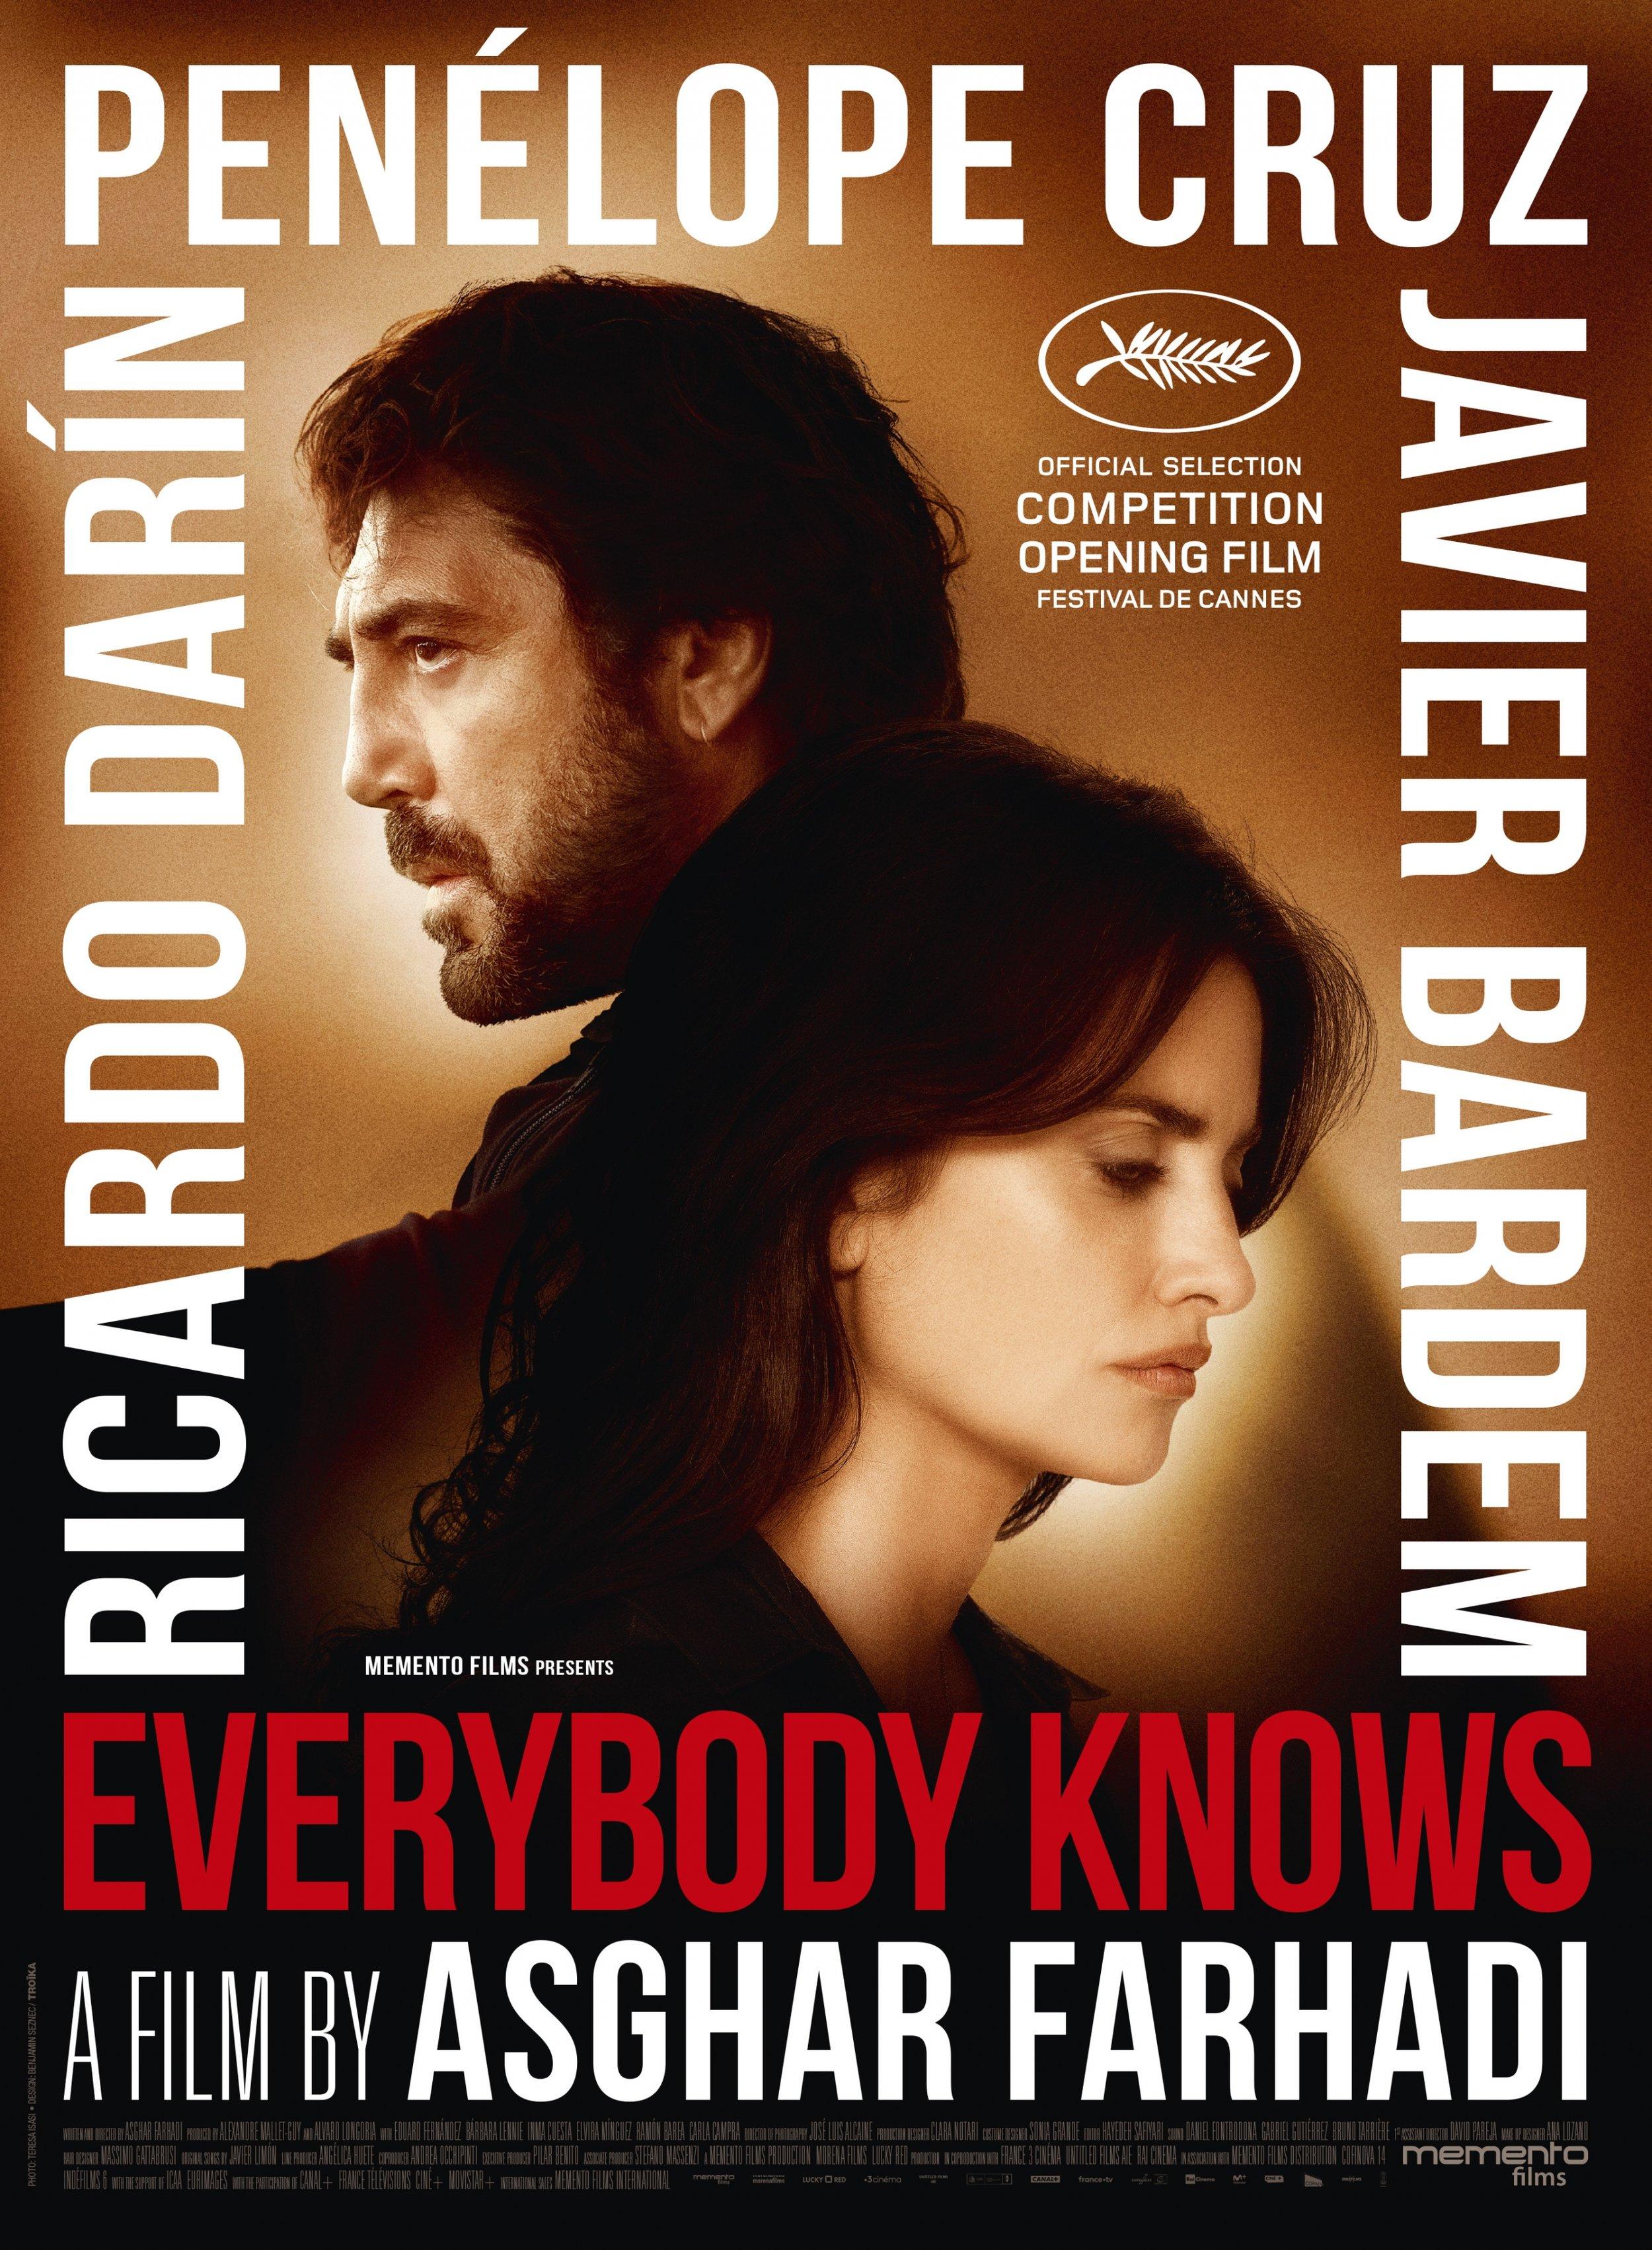 Everybody Knows (2018) - Directed By: Asghar FarhadiStarring: Penelope Cruz, Javier Bardem, Ricardo DarinRated: RRun Time: 2h 13mTMM Score: 4 StarsStrengths: Acting, MysteryWeakness: A Hair Long